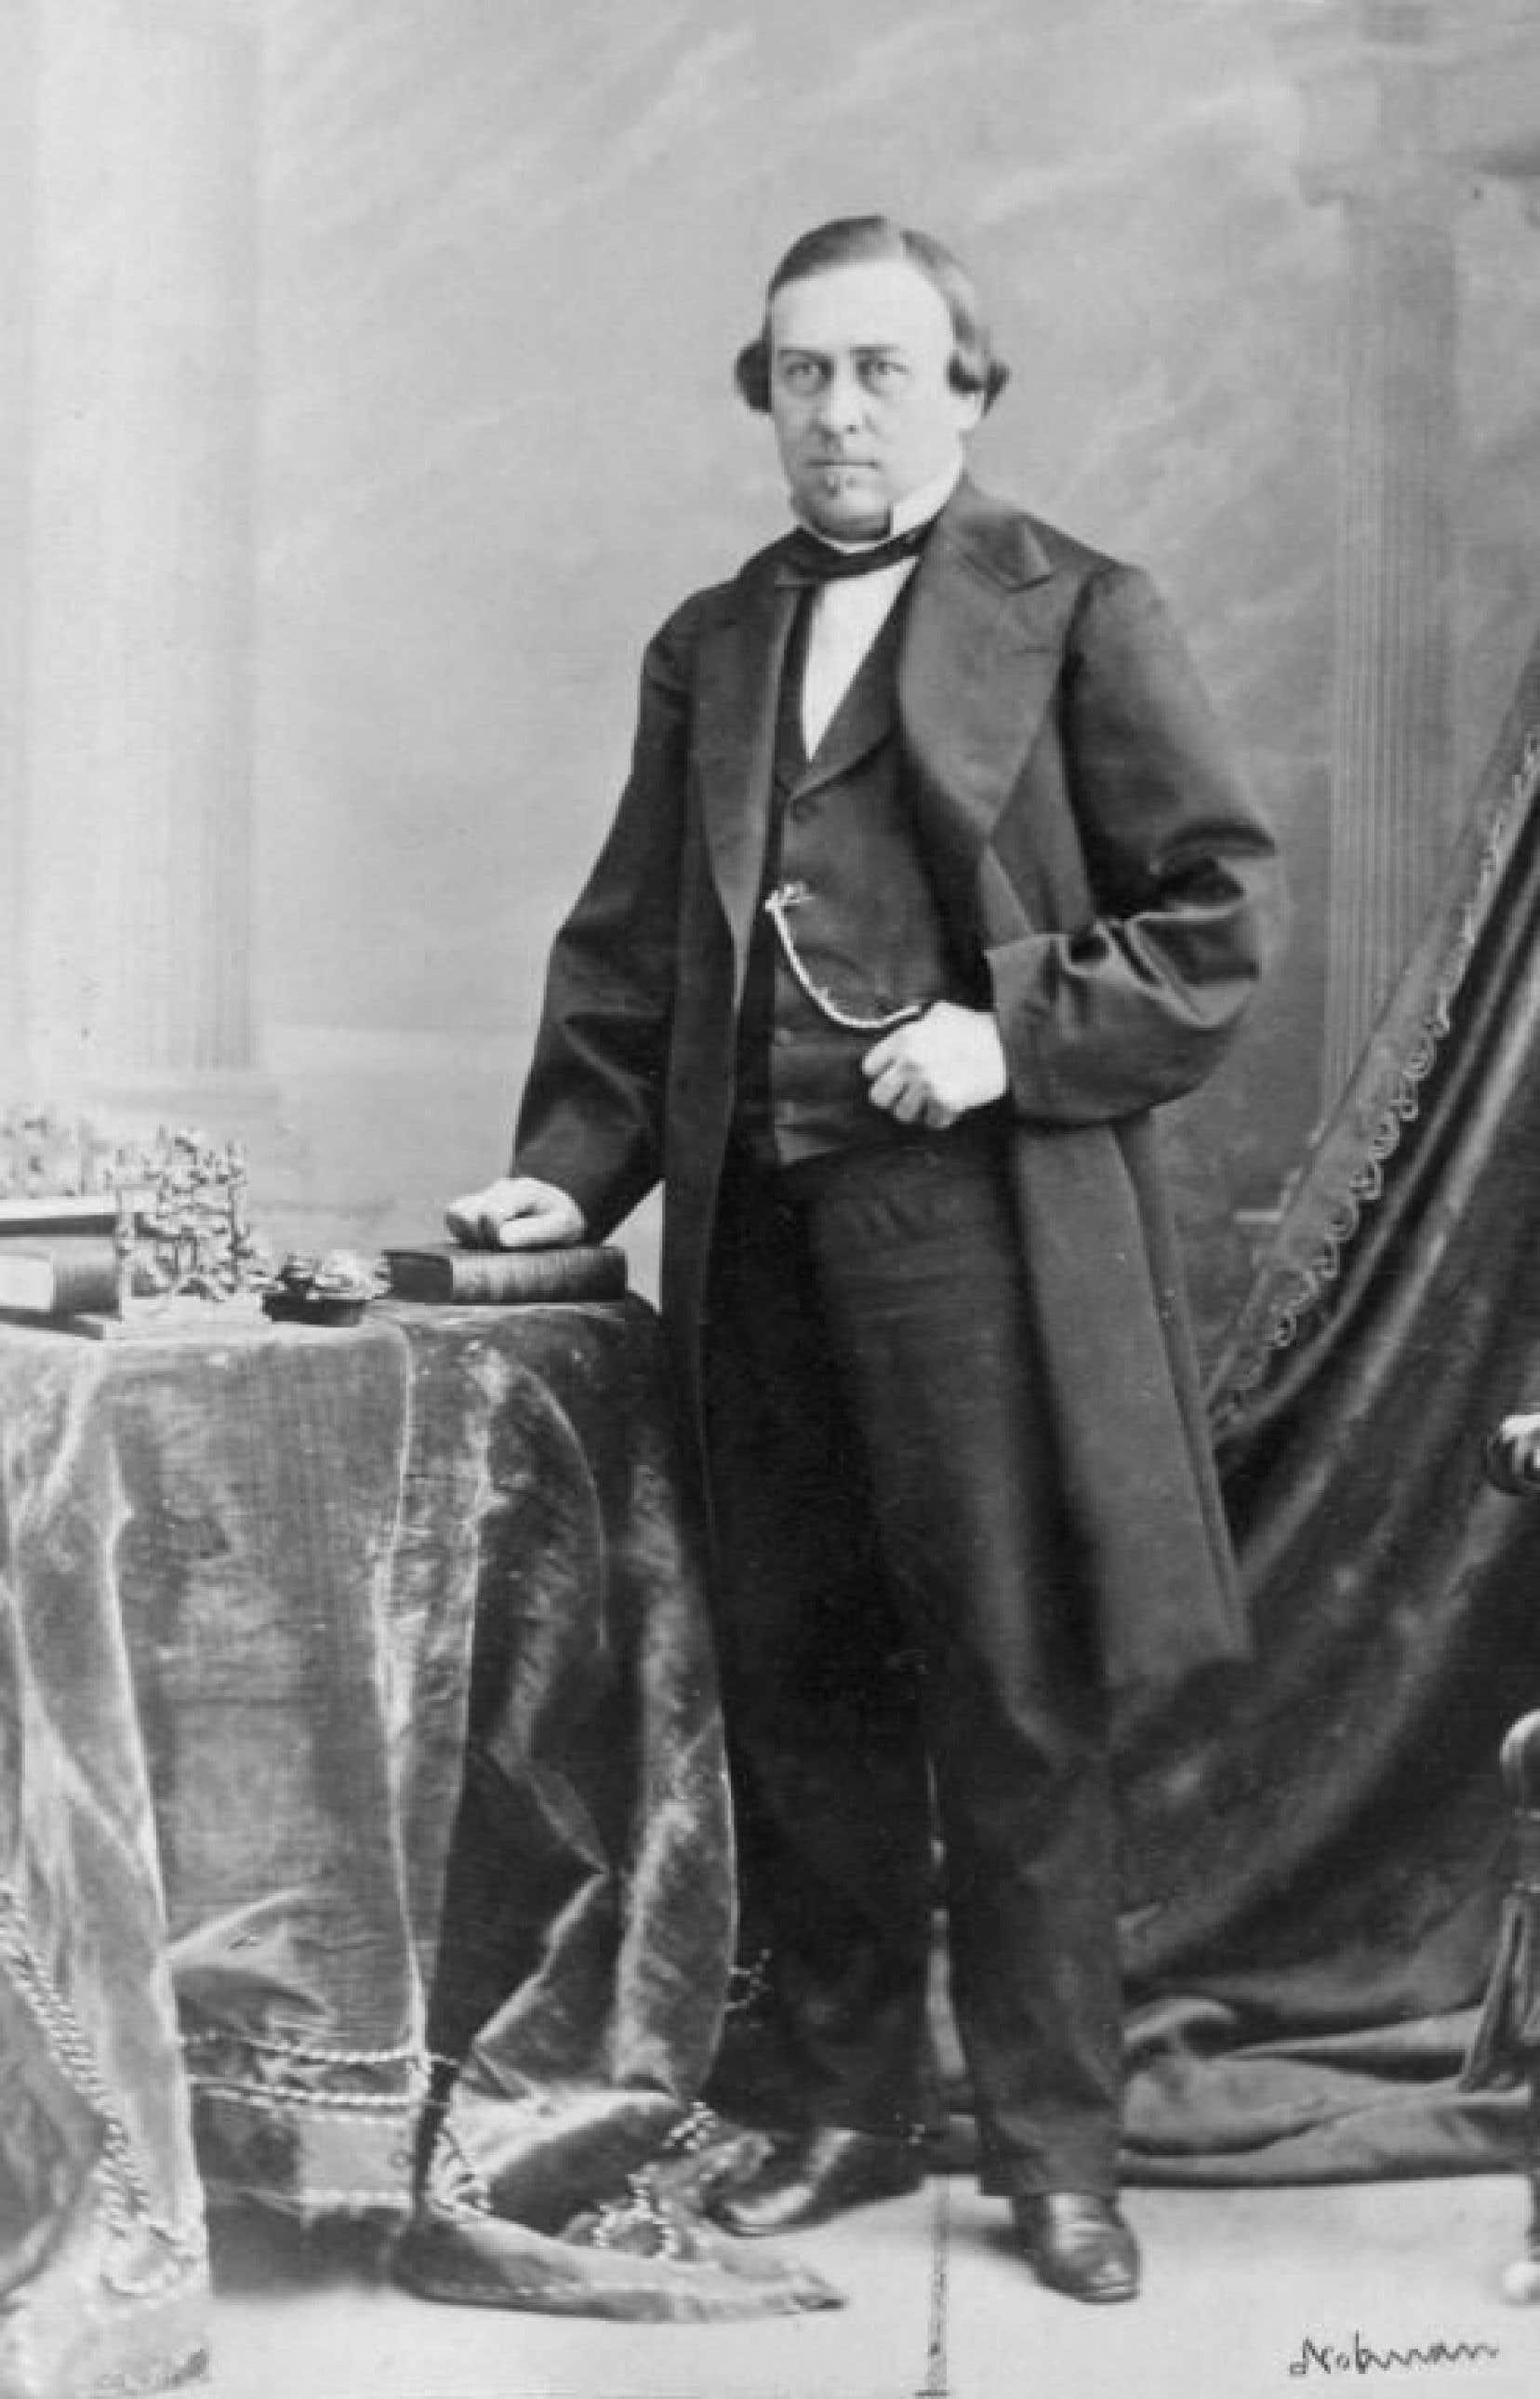 Hector L. Langevin